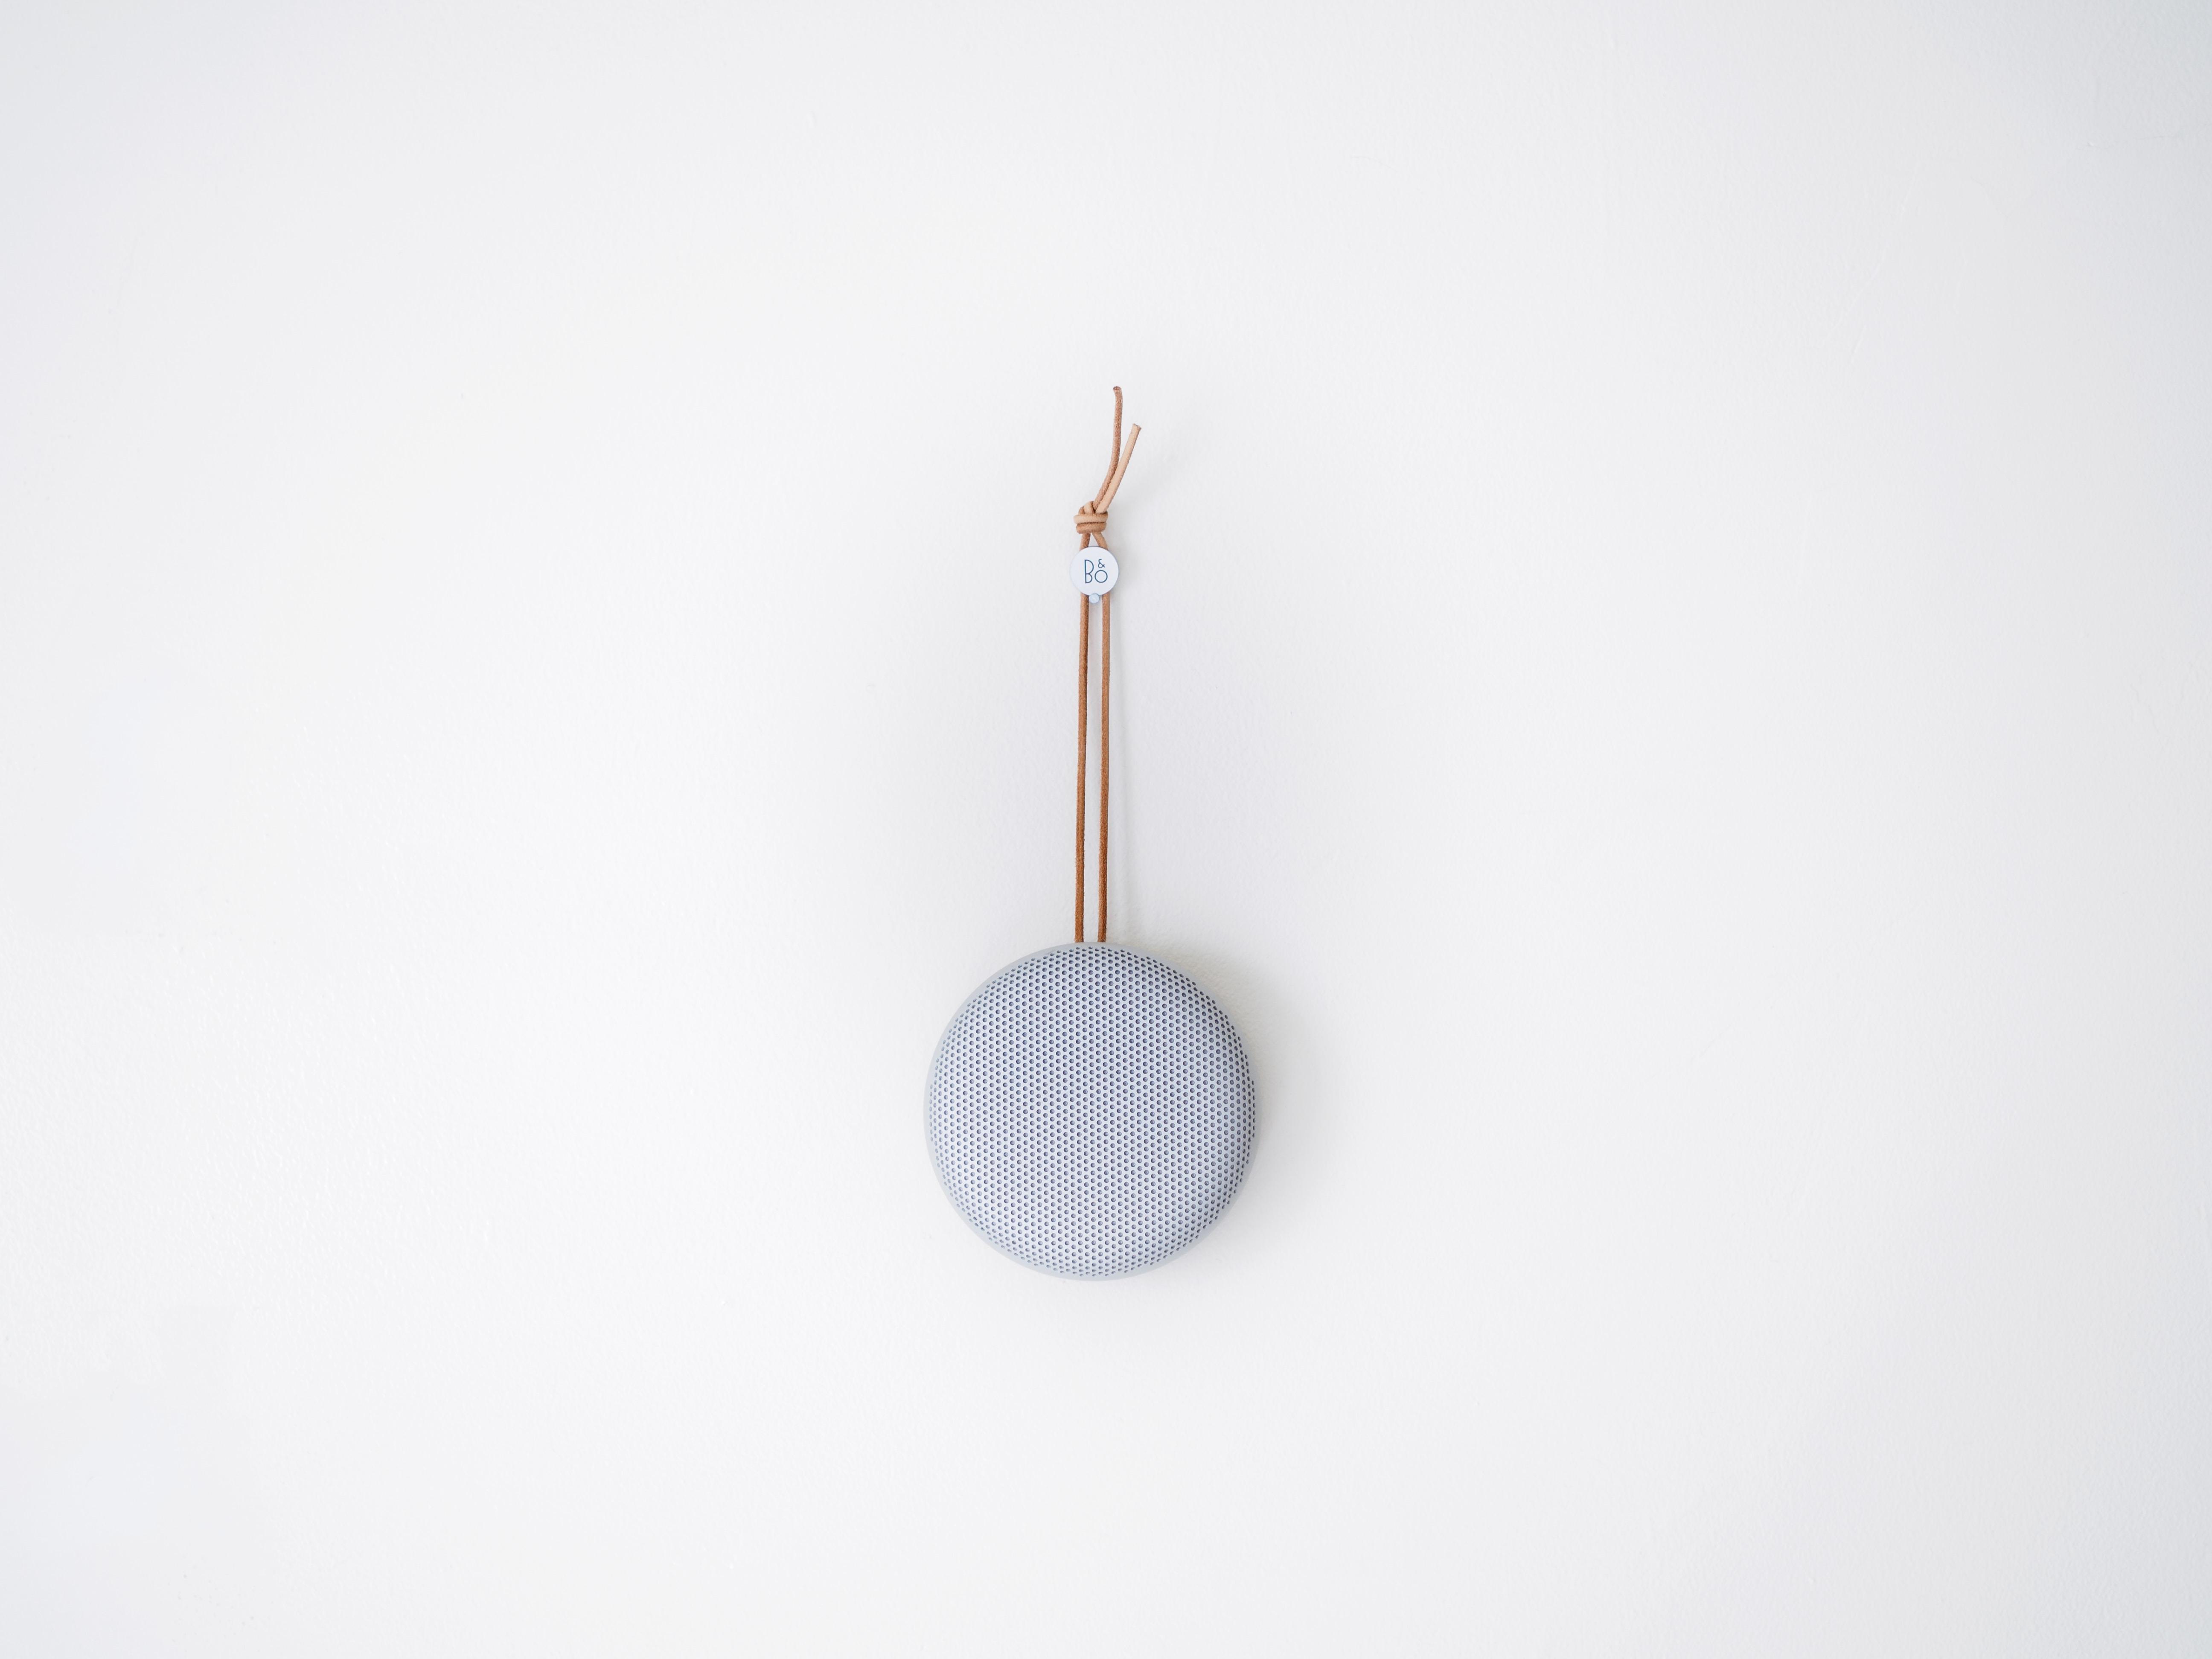 round grey hanging decor on white wall